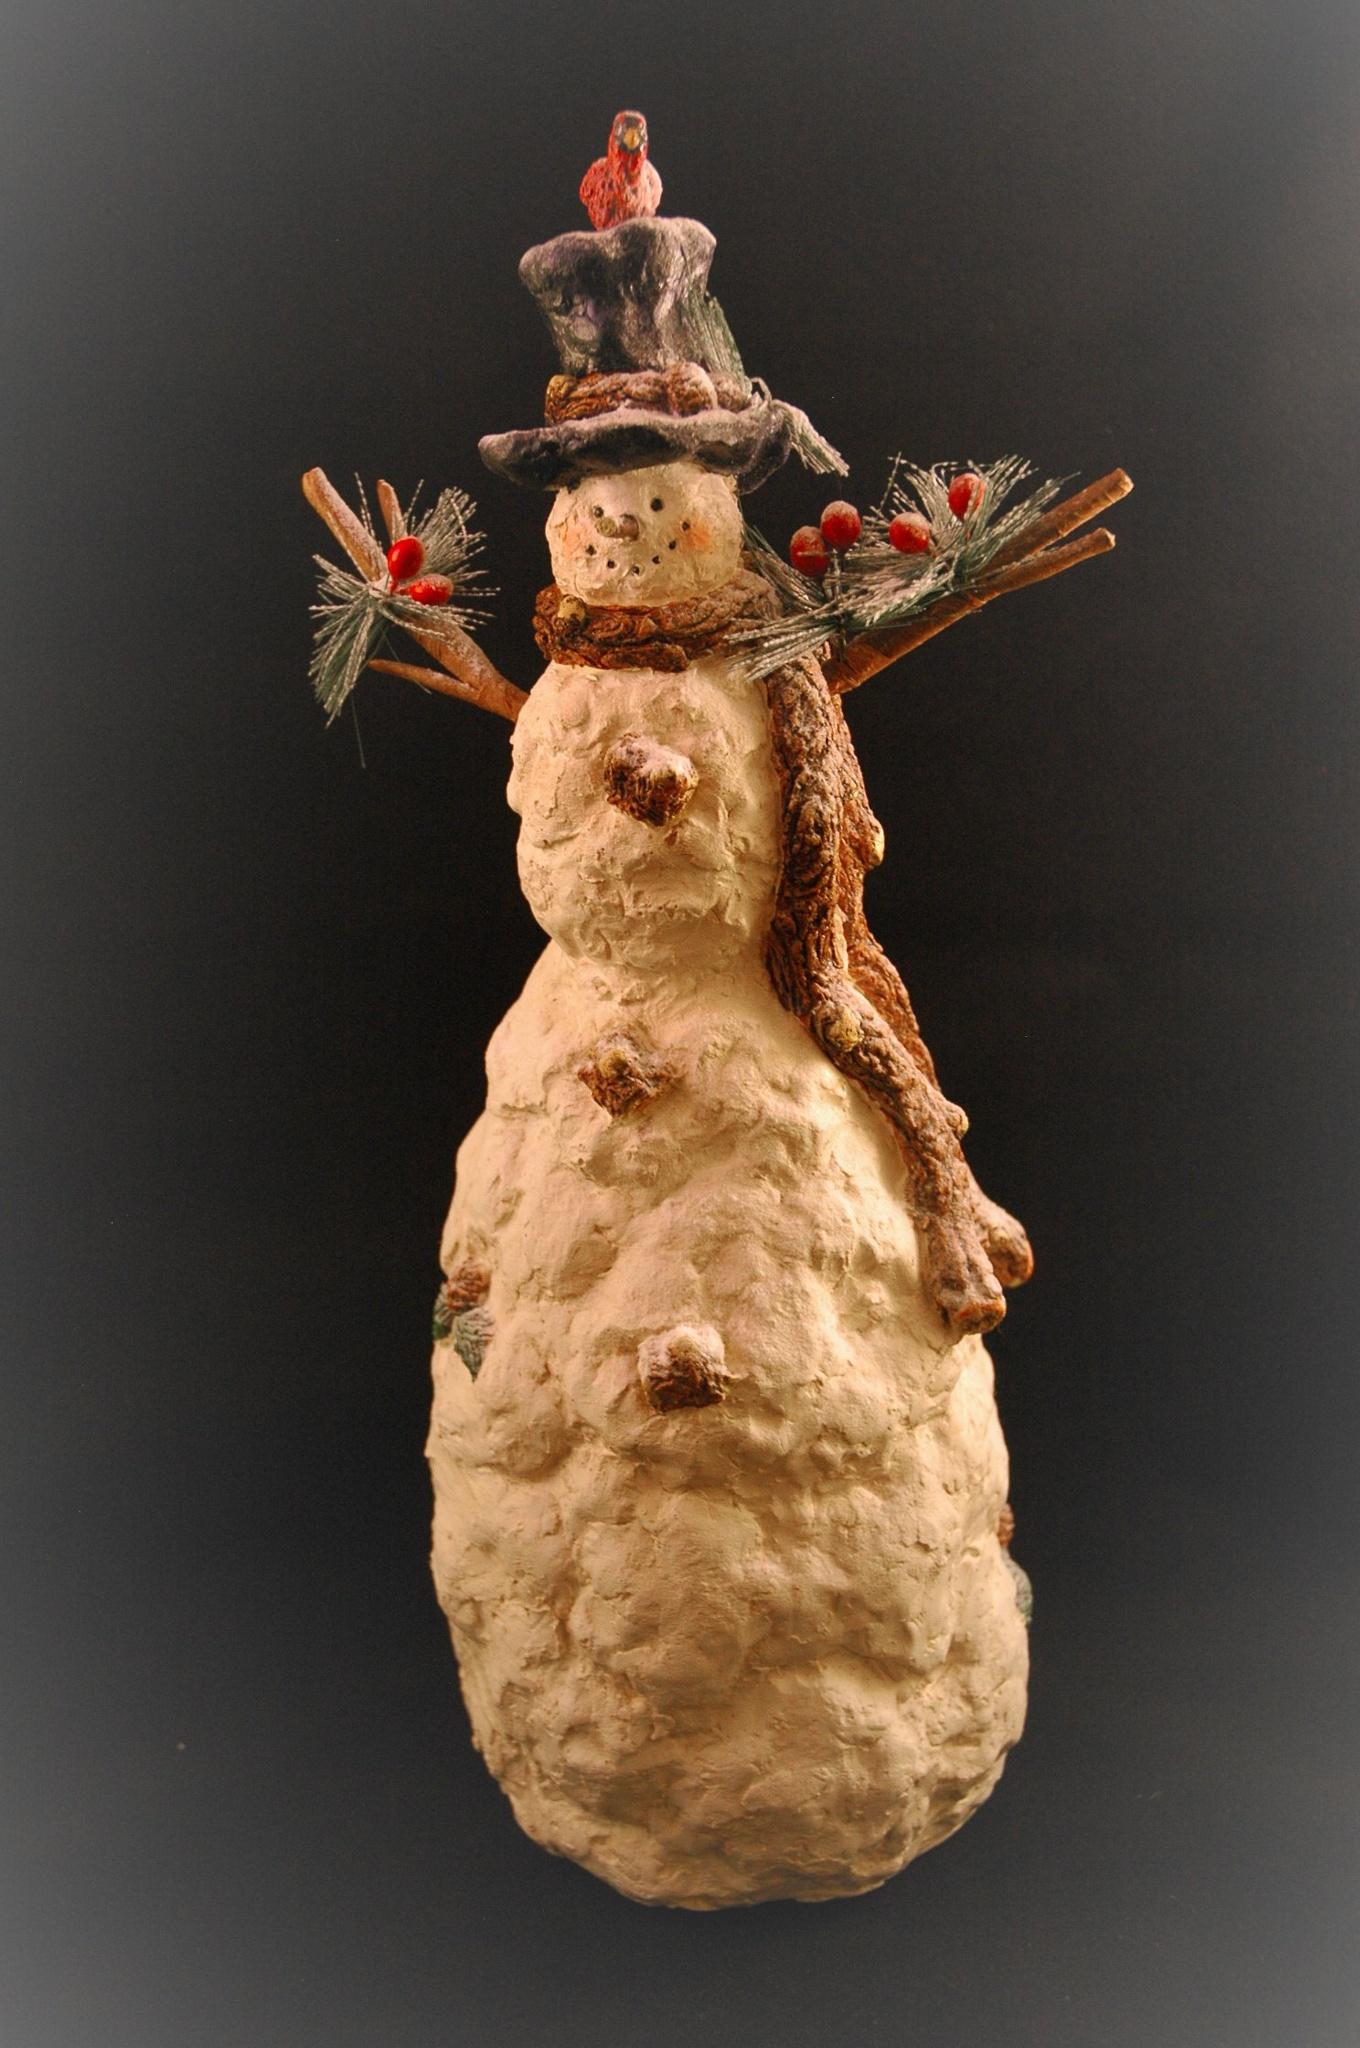 Snowman by Randy J Smith Photography